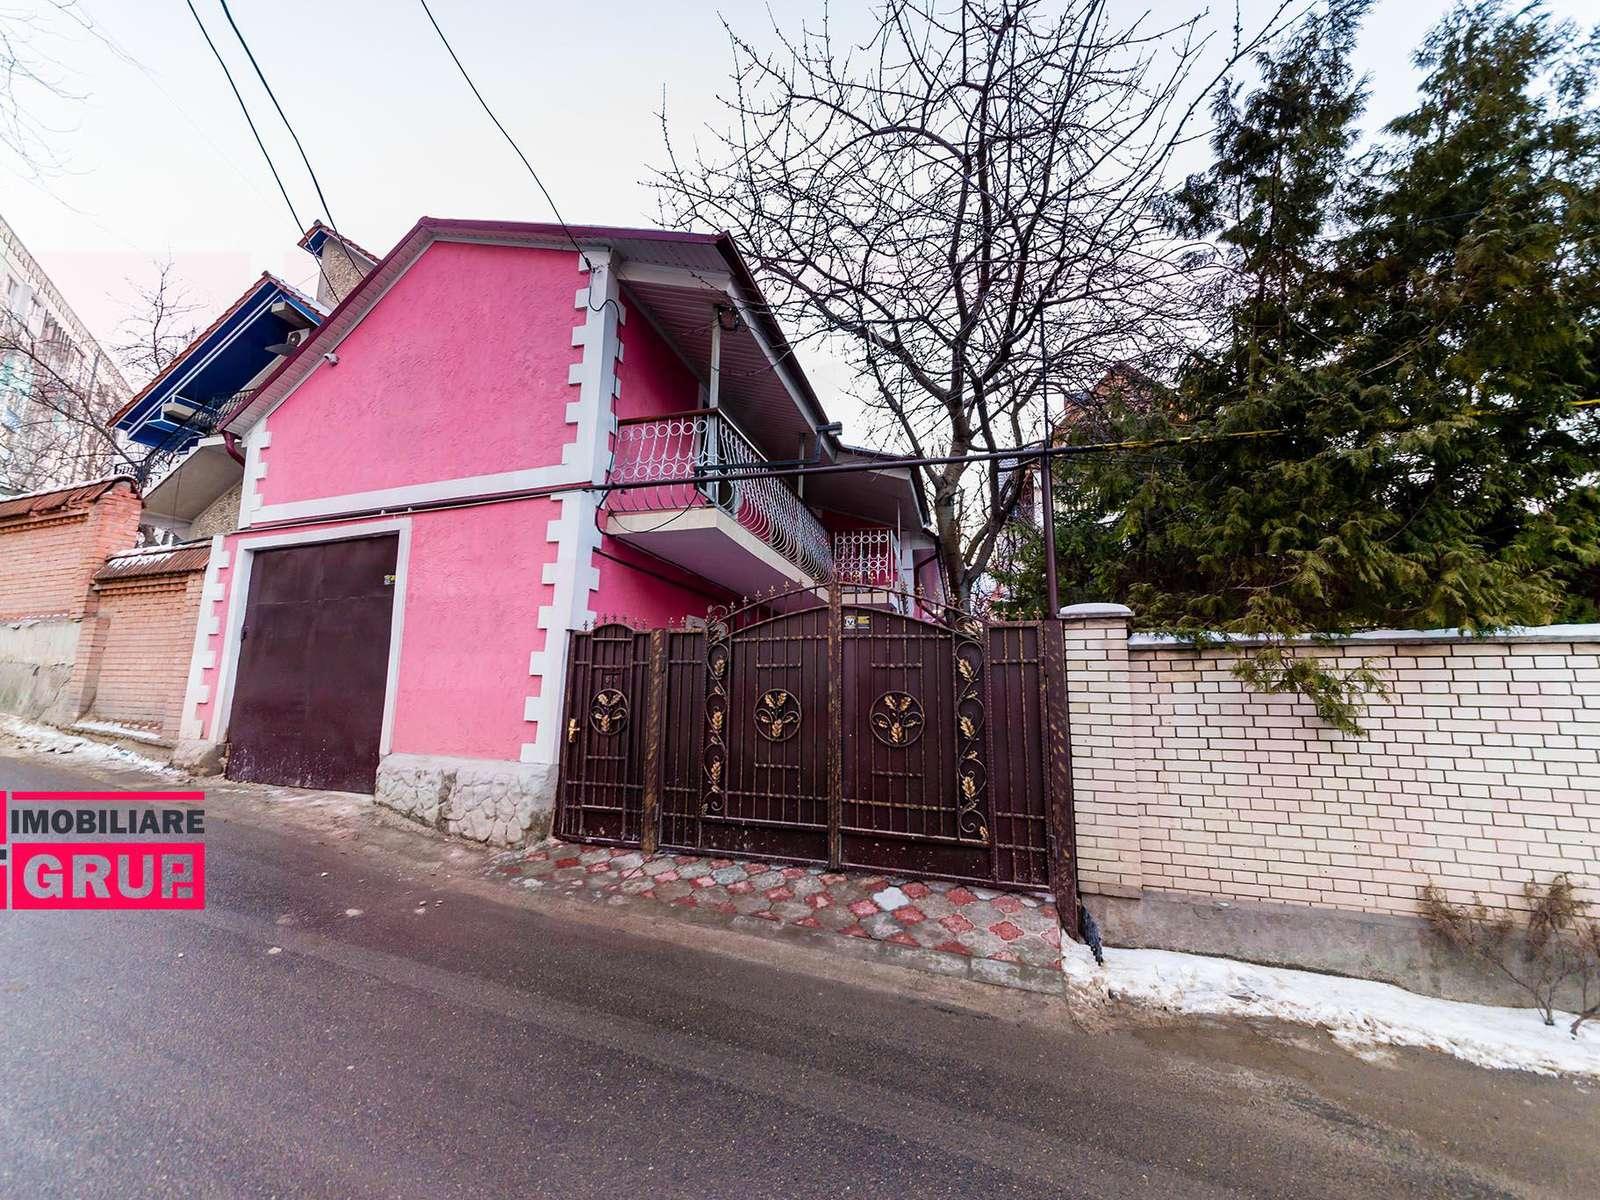 Oferta exclusiva ! casa cu 2 nivele in sector Botanica